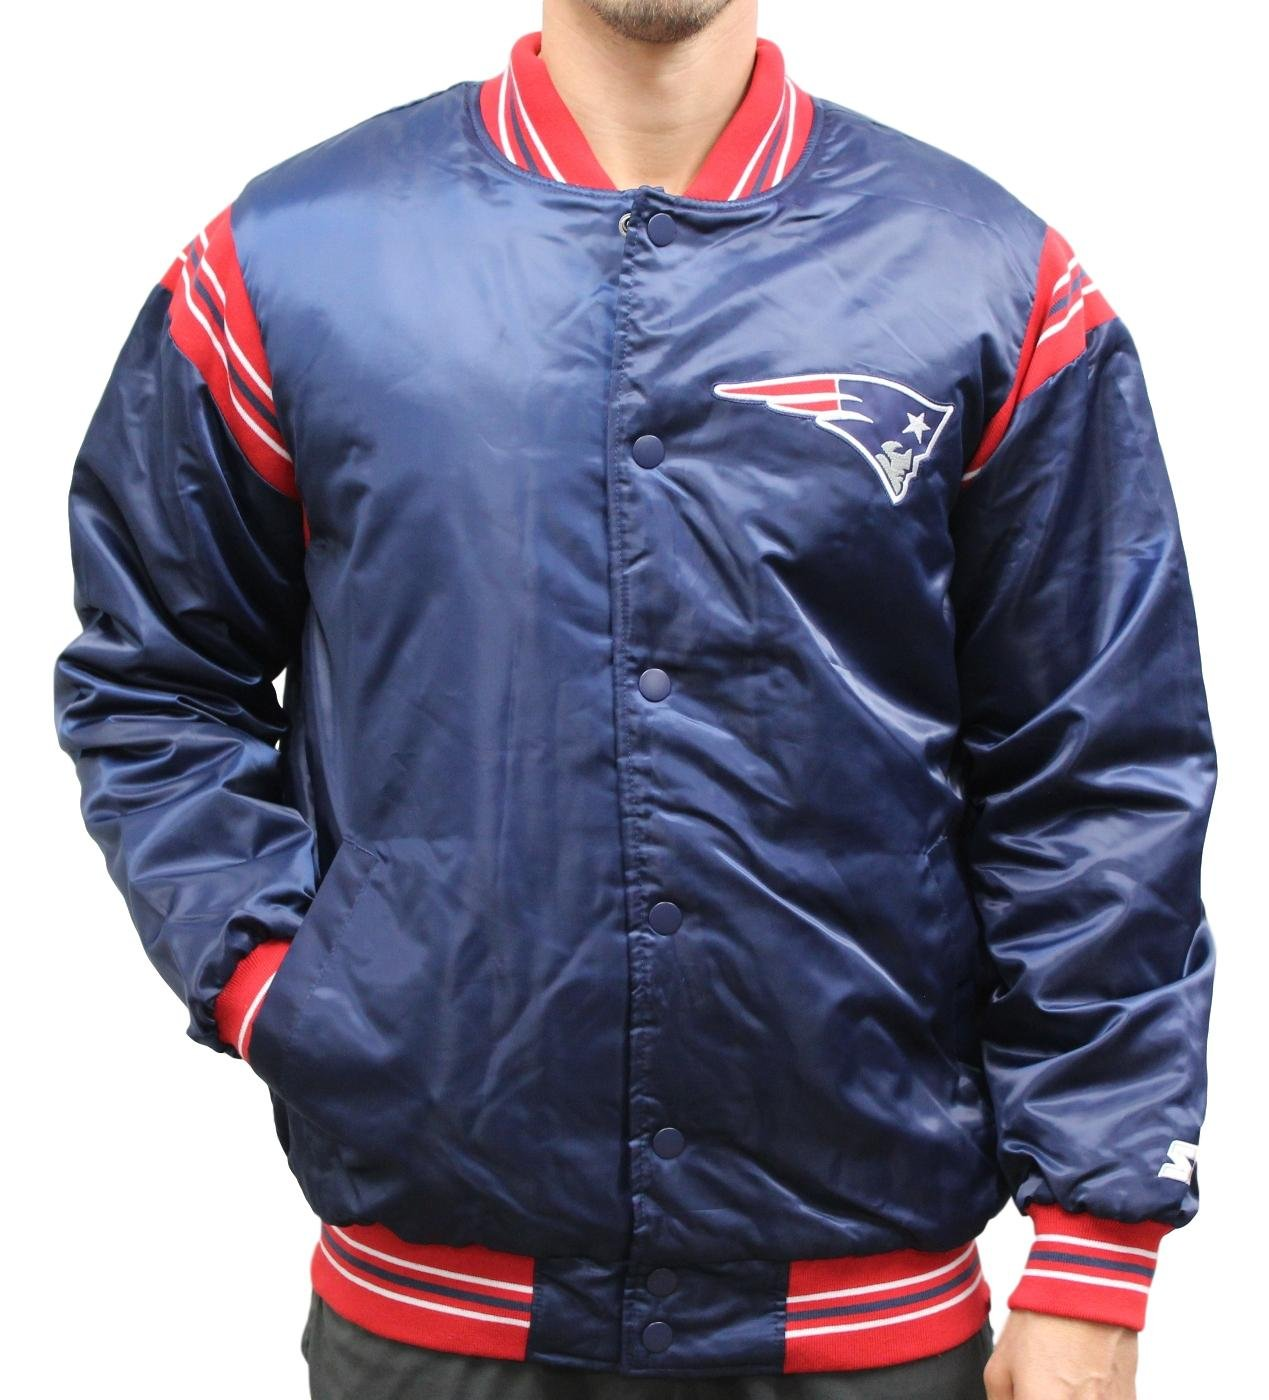 cheaper f0294 9908b Amazon.com : New England Patriots NFL Men's Starter